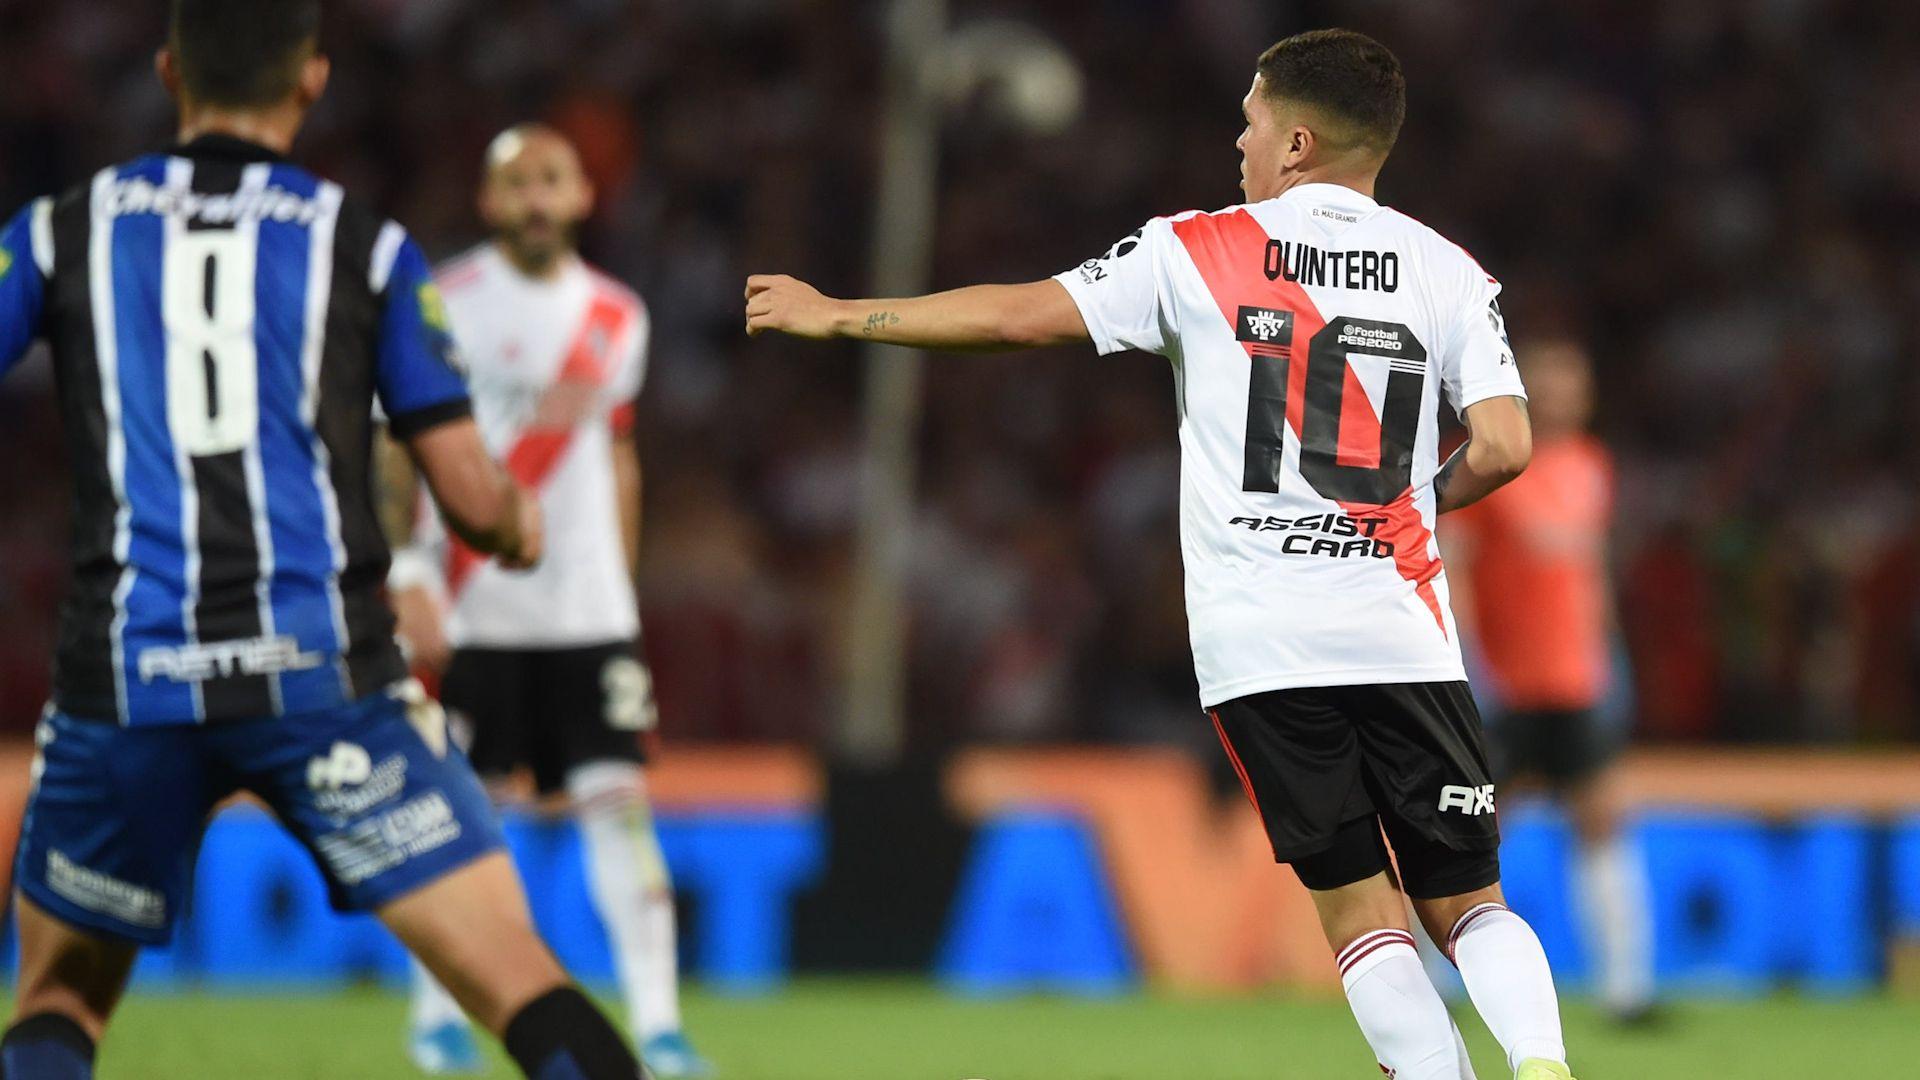 Quintero volvió a las canchas tras casi siete meses de recuperación (@RiverPlate)